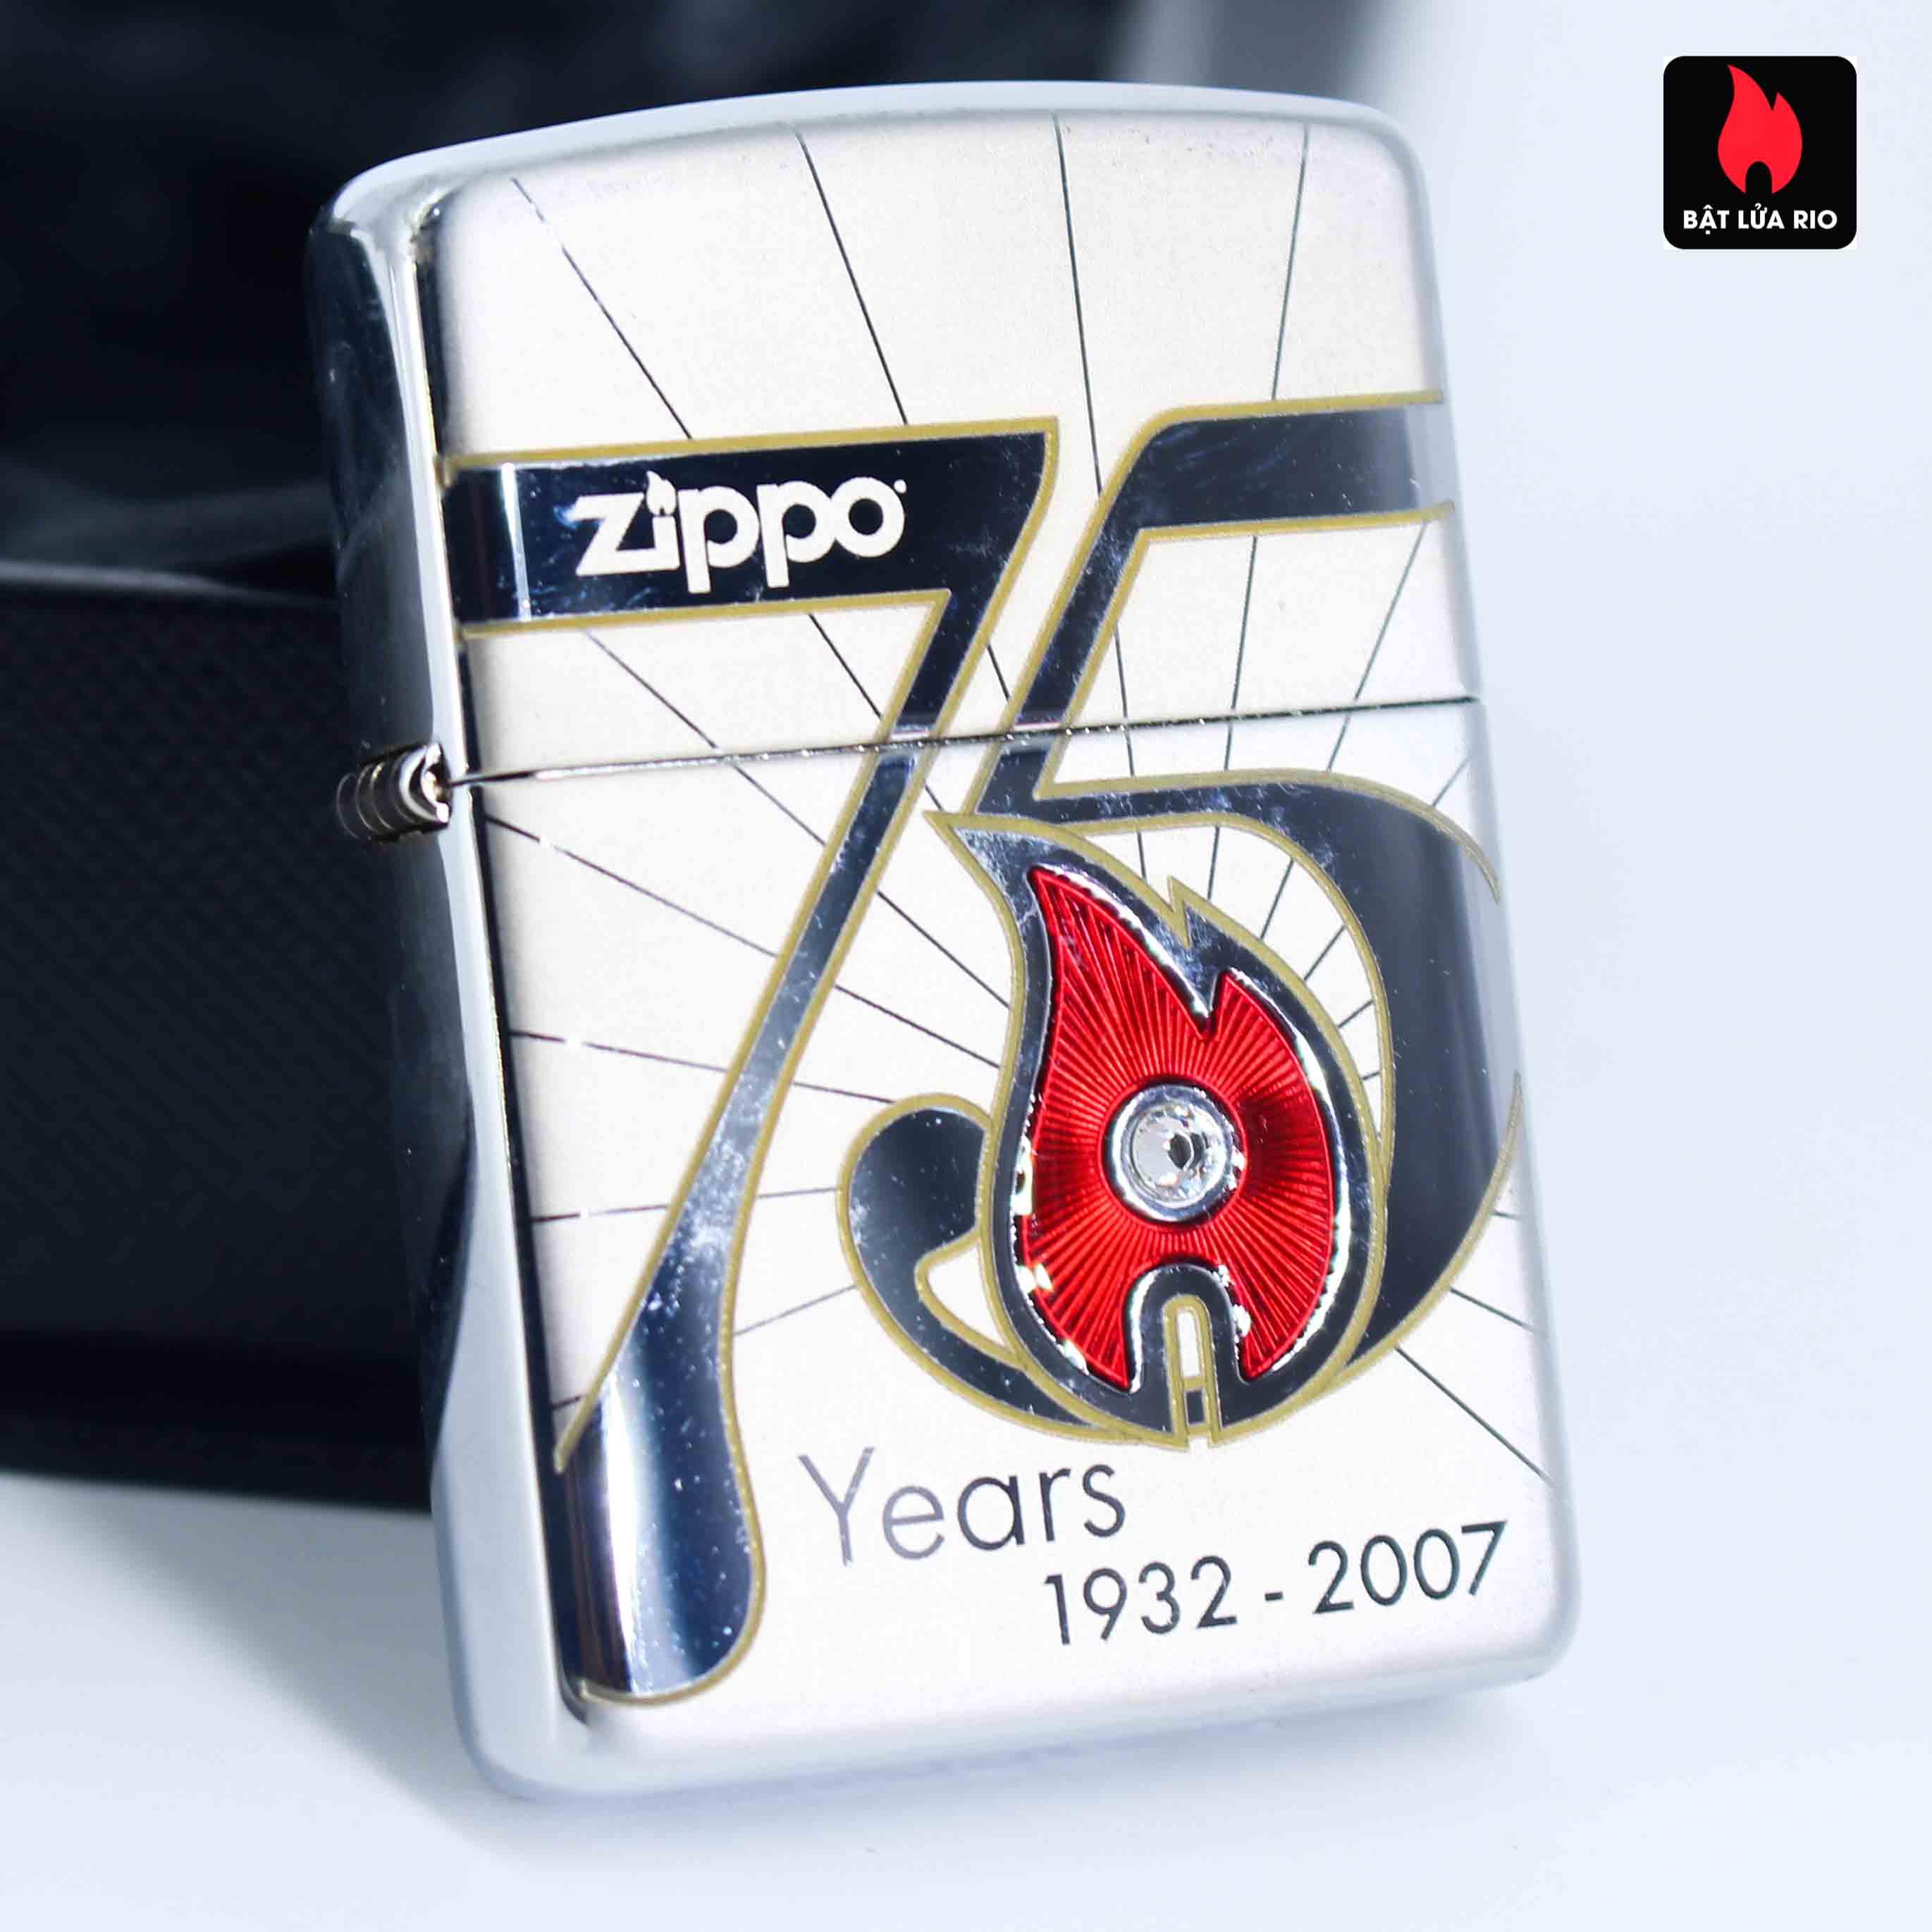 Zippo 2007 – 75th Anniversary Edition – United Kingdom – Limited GRB 1 Of 500